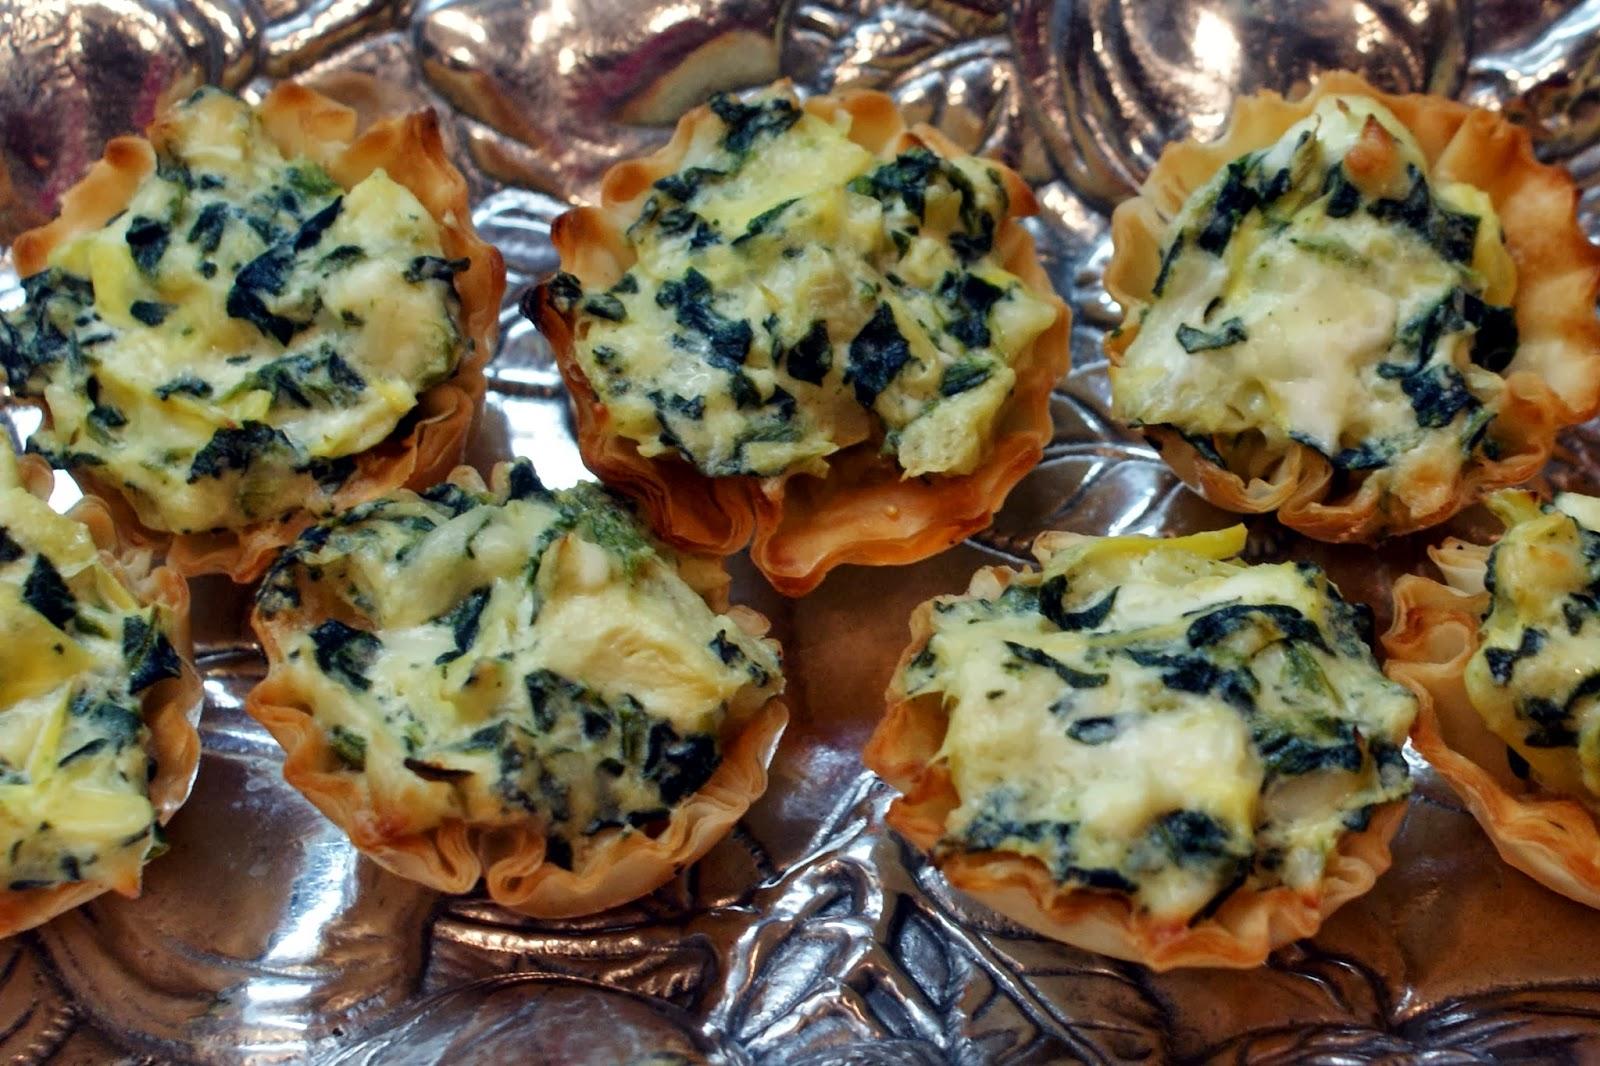 The Baker's Mann: Spinach-Artichoke Cups